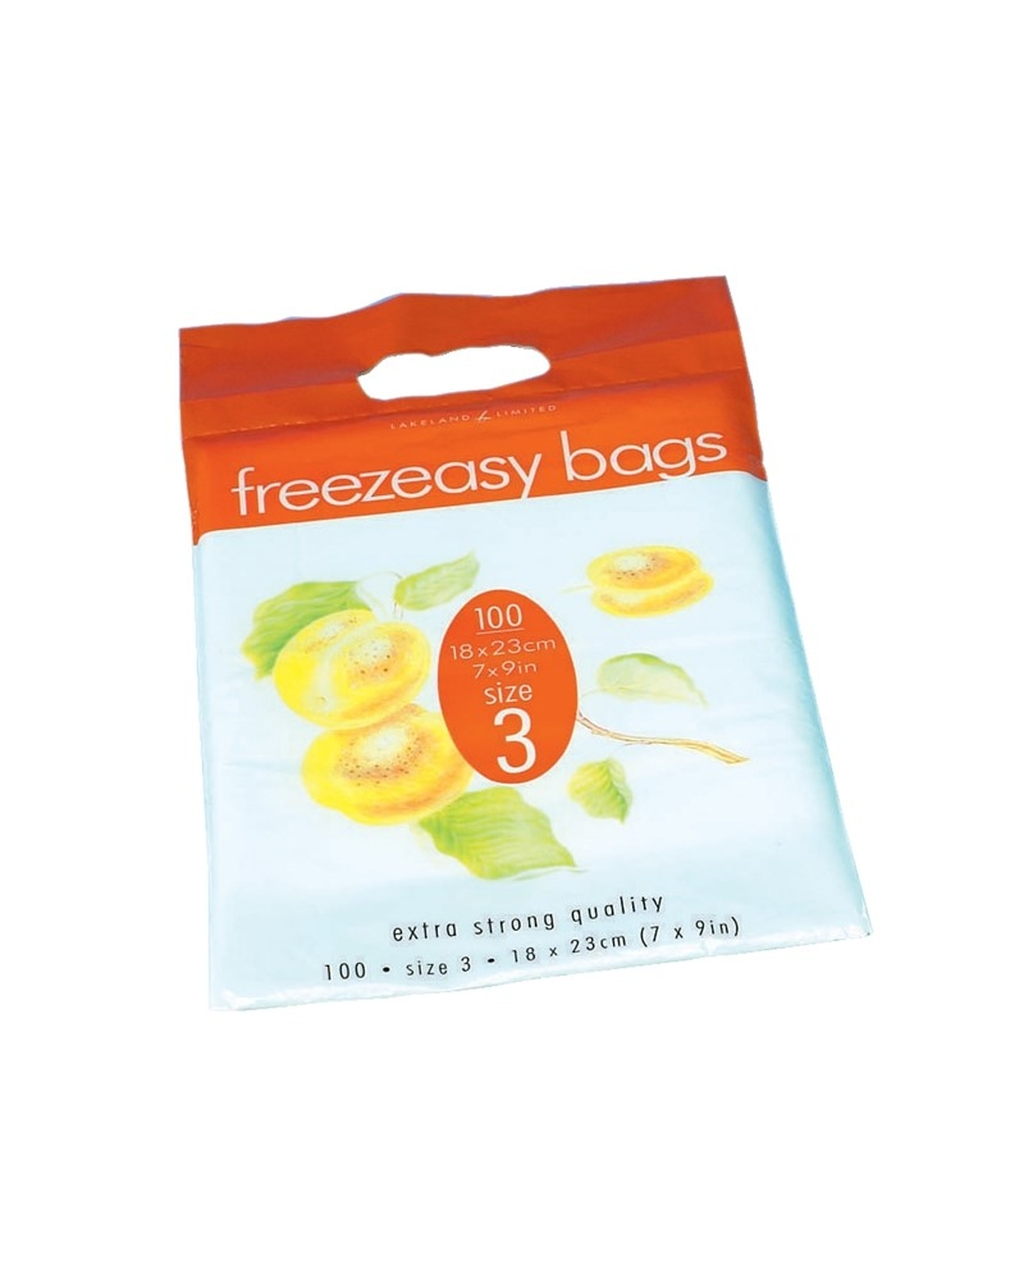 18 x 23cm Freezer Bags